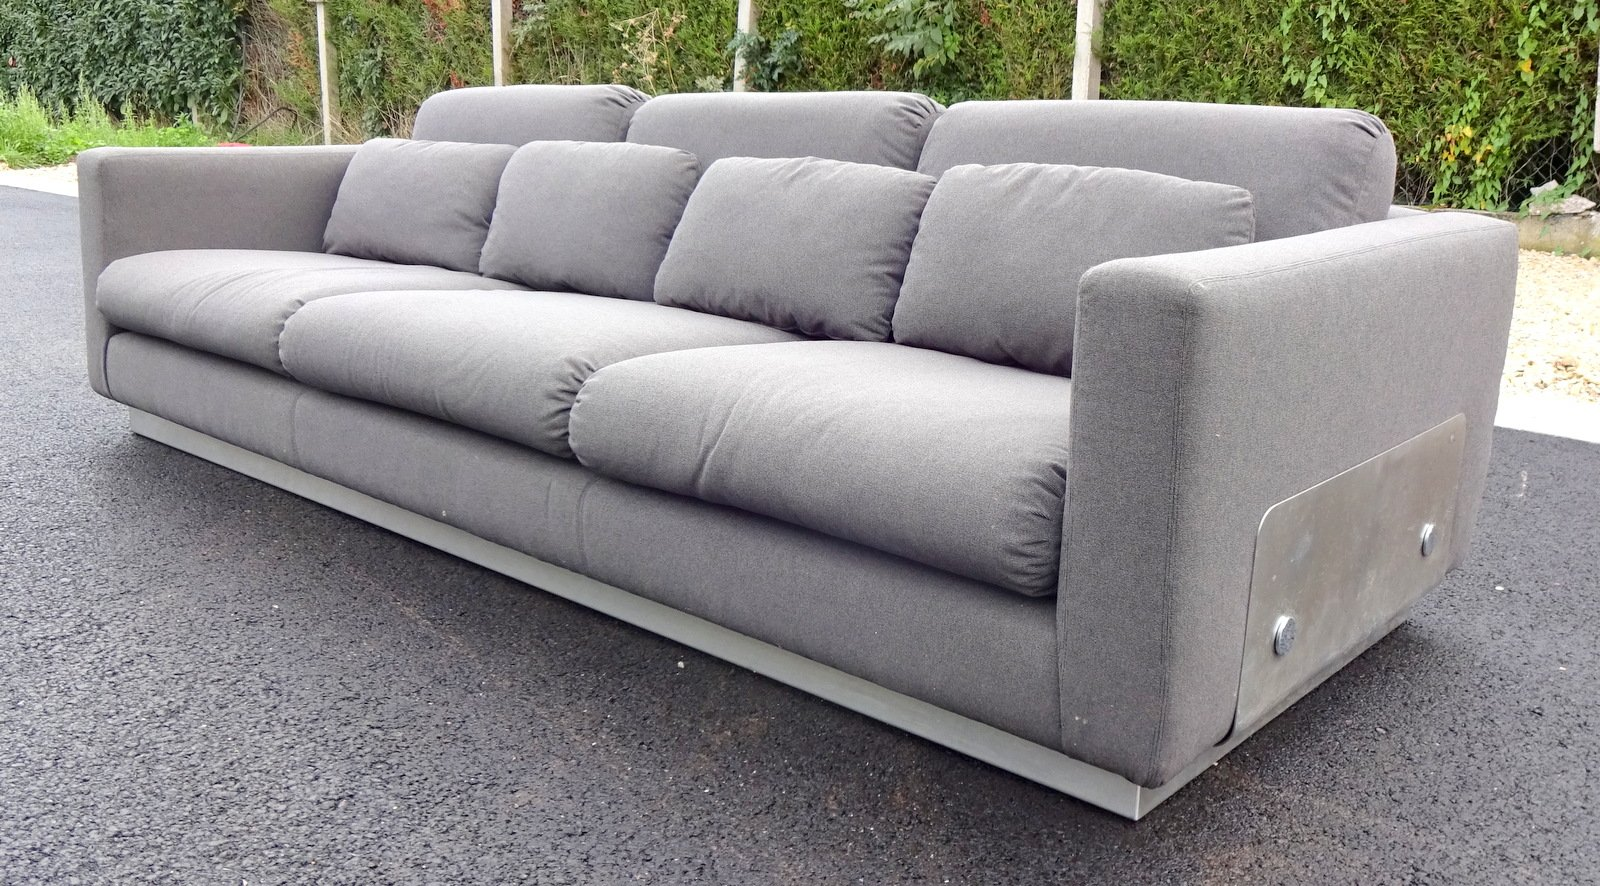 graues sofa 1970er bei pamono kaufen. Black Bedroom Furniture Sets. Home Design Ideas